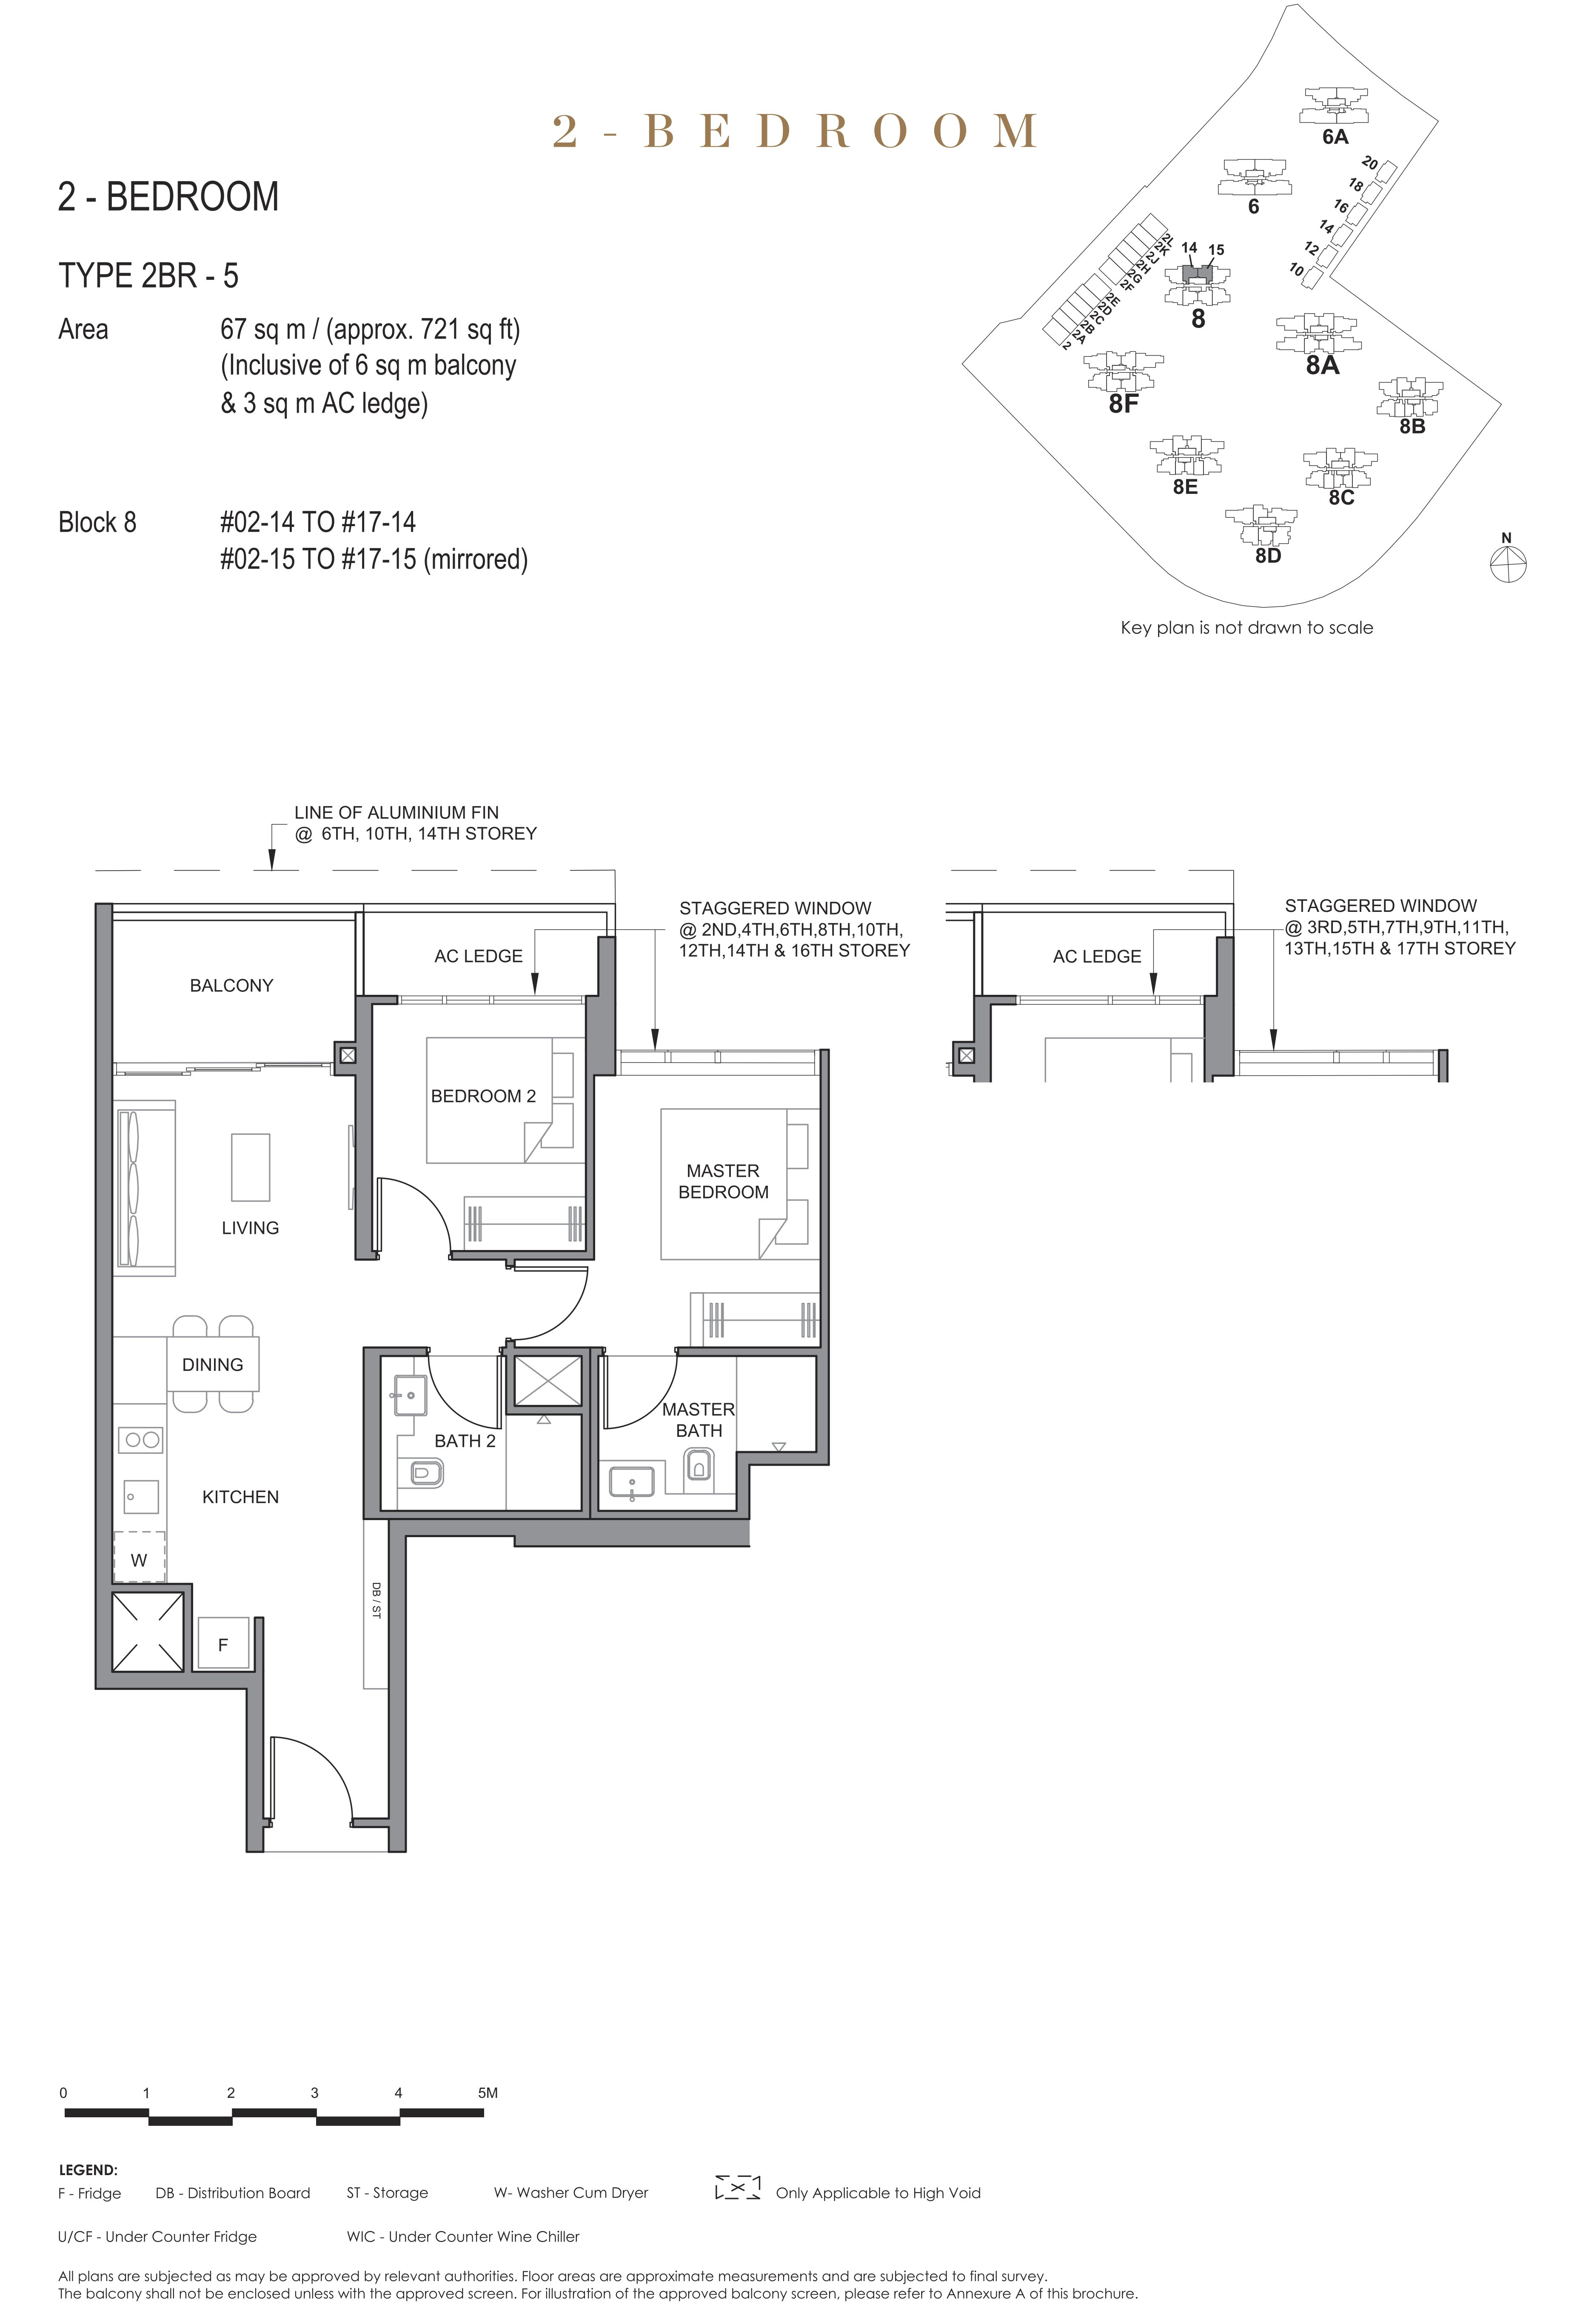 Parc Clematis 锦泰门第 elegance 2 bedroom 2卧房 2BR-5